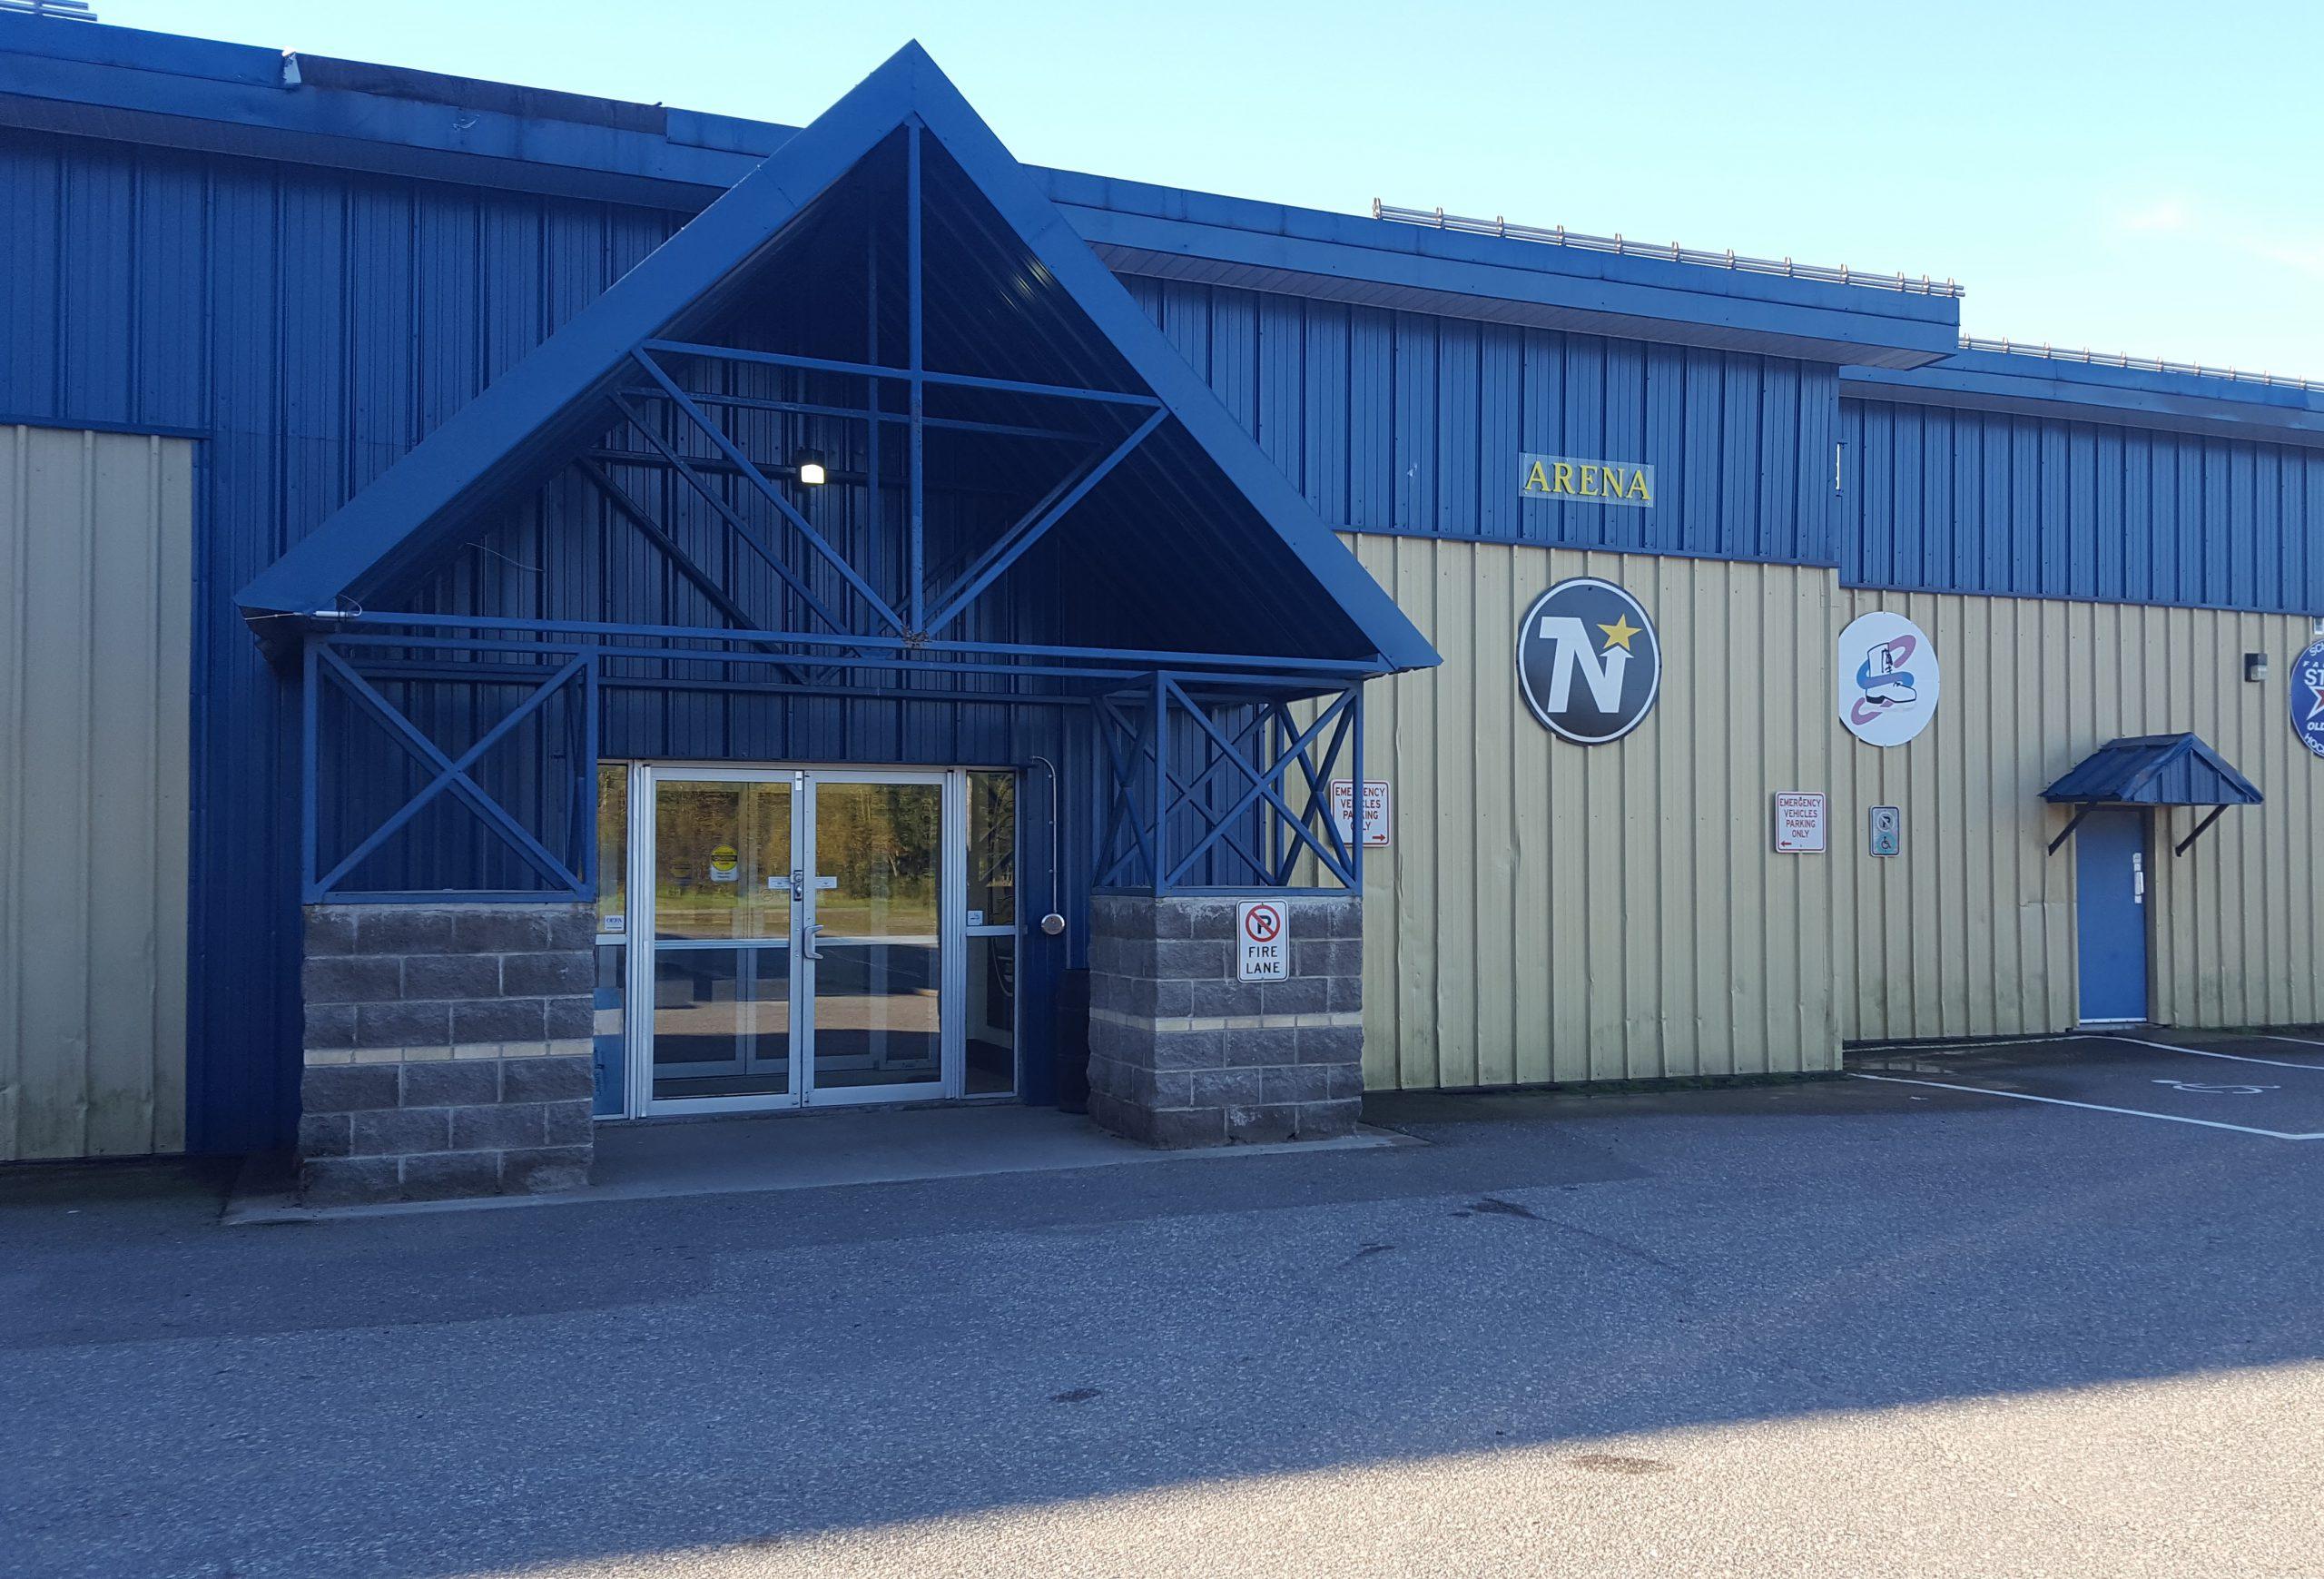 Schreiber arena, Metal building with glass door for entrance